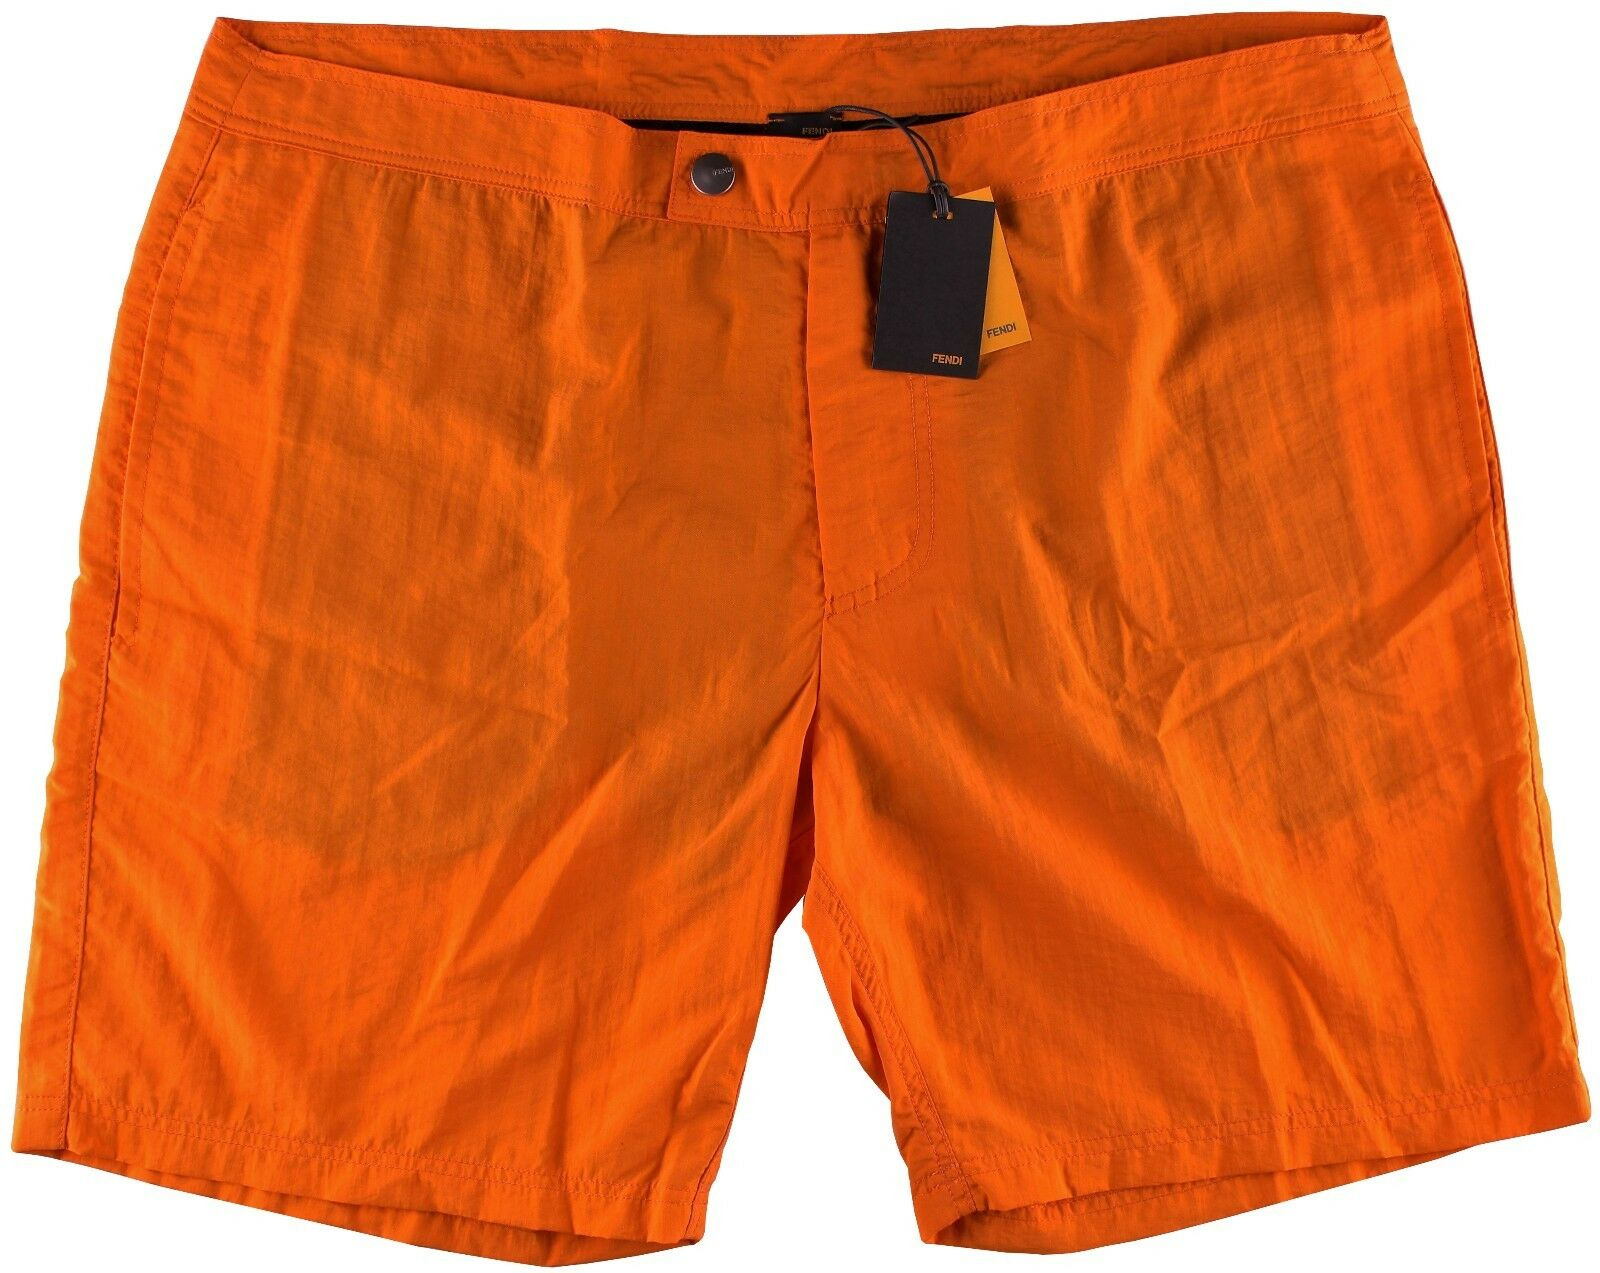 NWT FENDI SWIM TRUNKS shorts fxb060 solid orange polyamide luxury  52 L